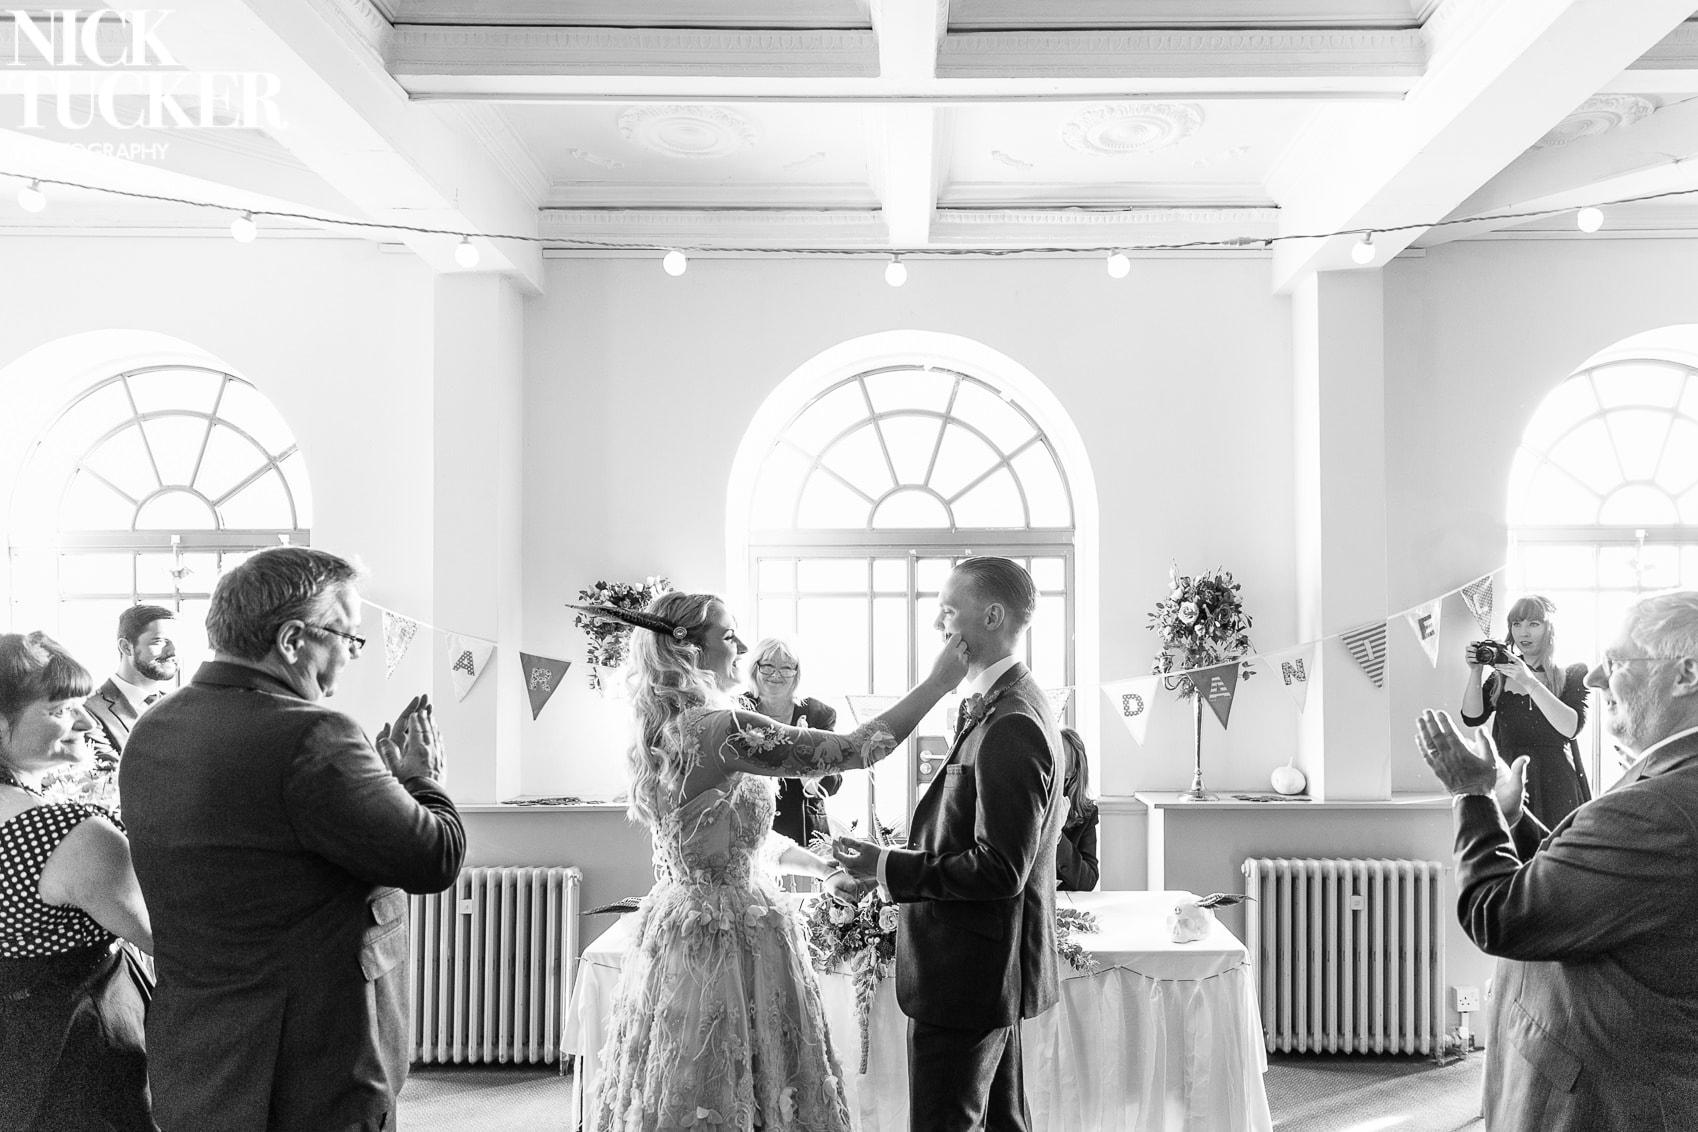 Alternative Brighton Wedding Photography | Nick Tucker Photography